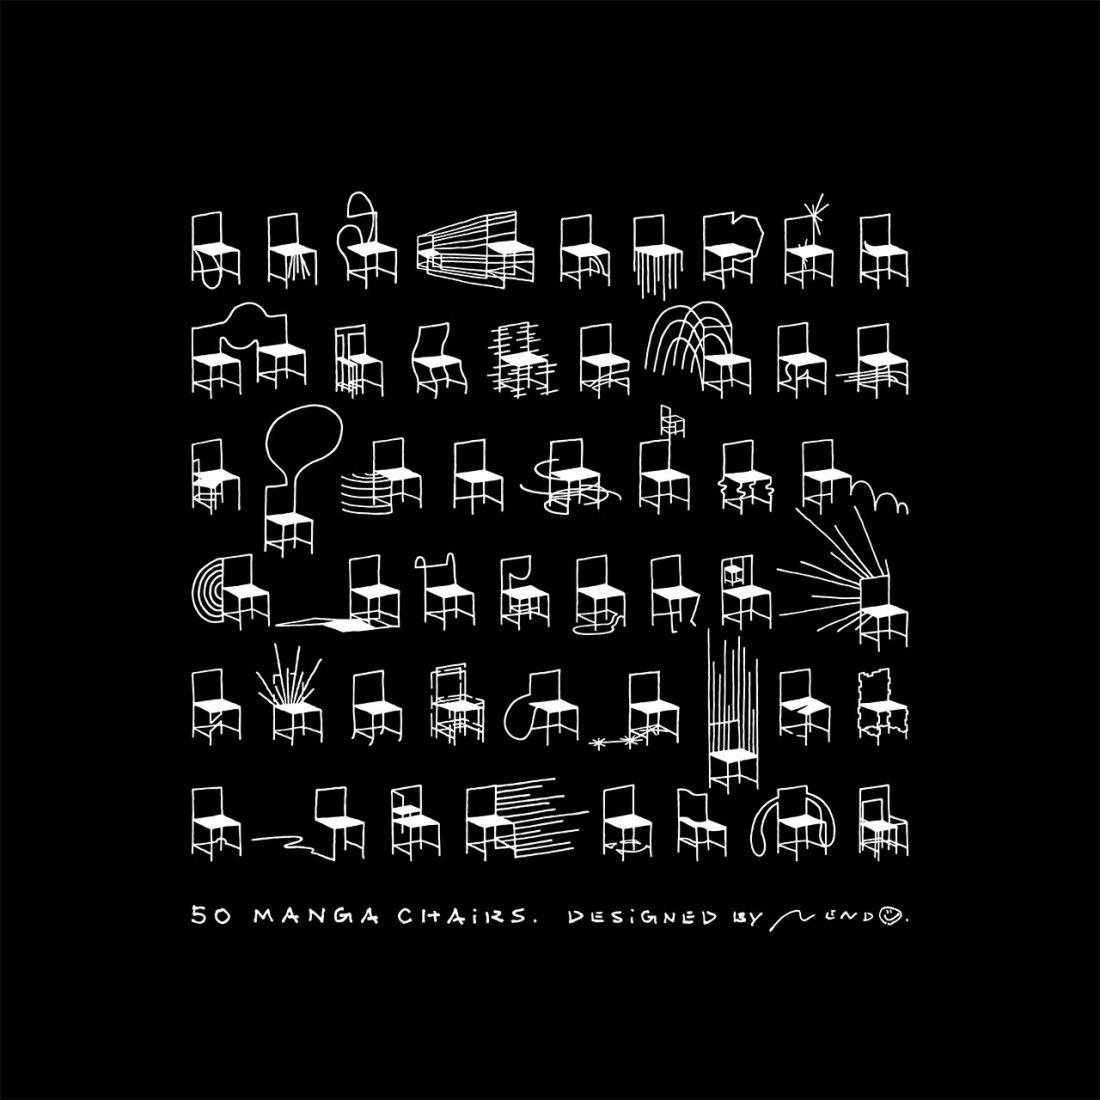 50 Manga Chairs. Nendo at Milan Design Week 2016, for Friedman Benda. Photograph © Takumi Ota.